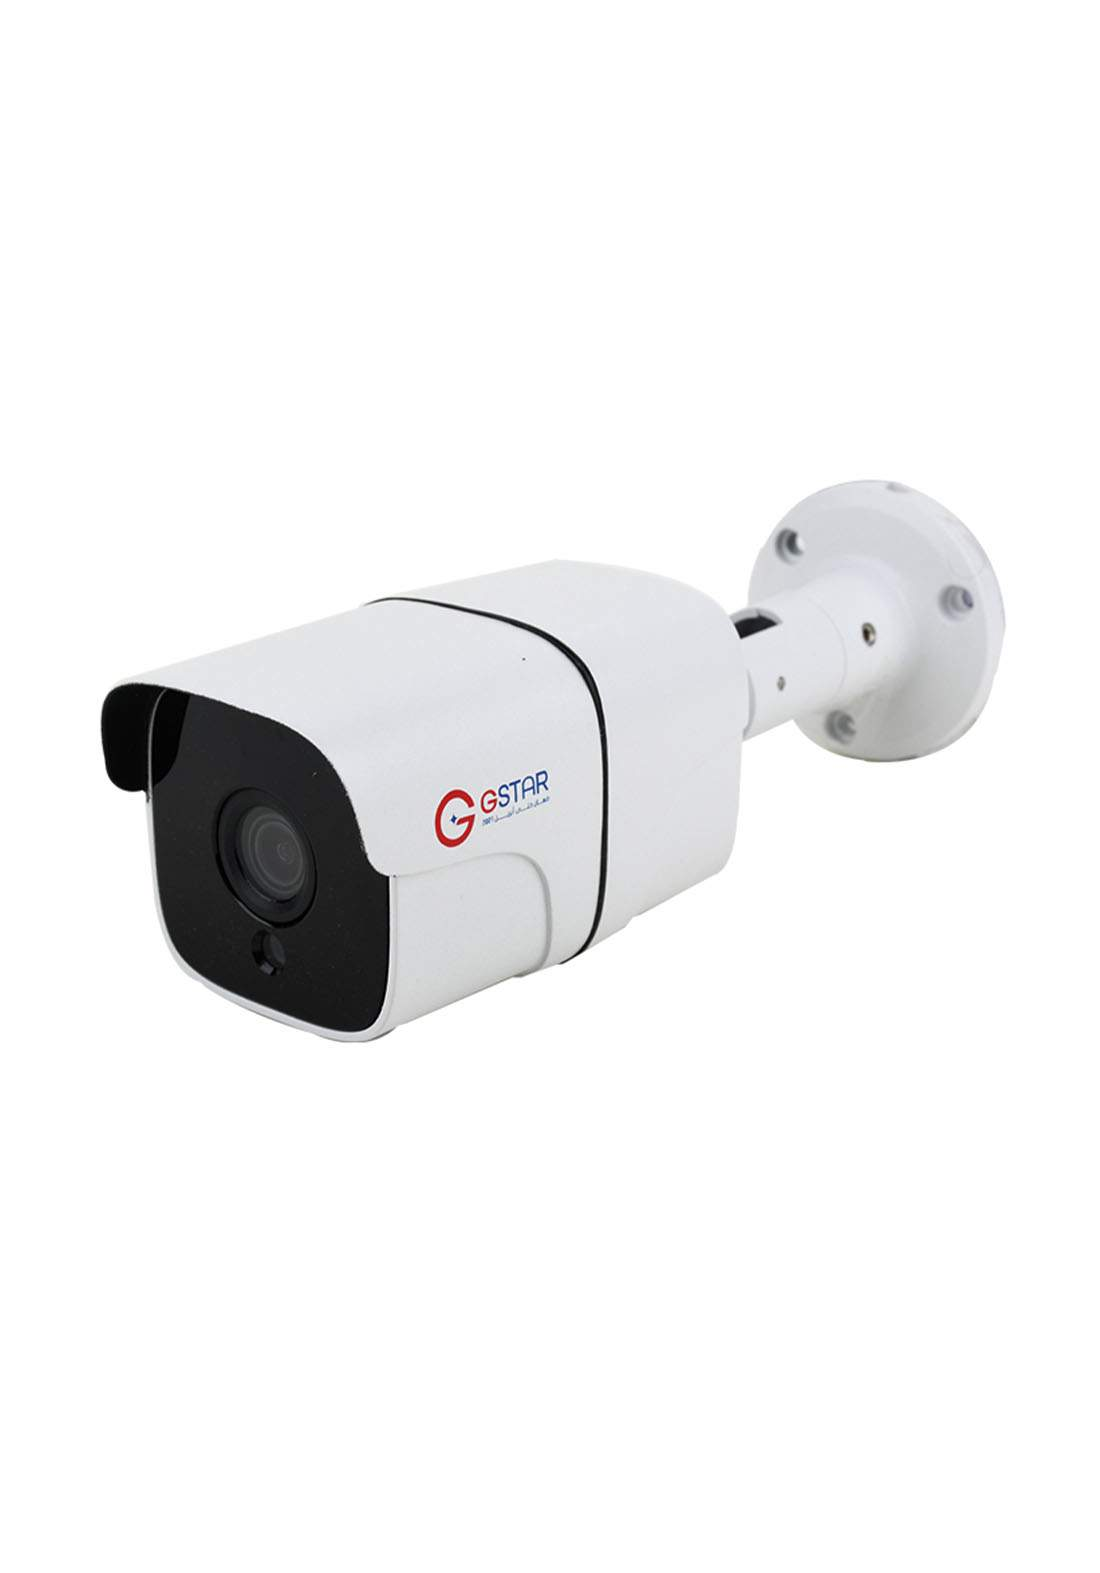 Gstar  Analog High Definition Starlight AHD Camera - White كاميرا